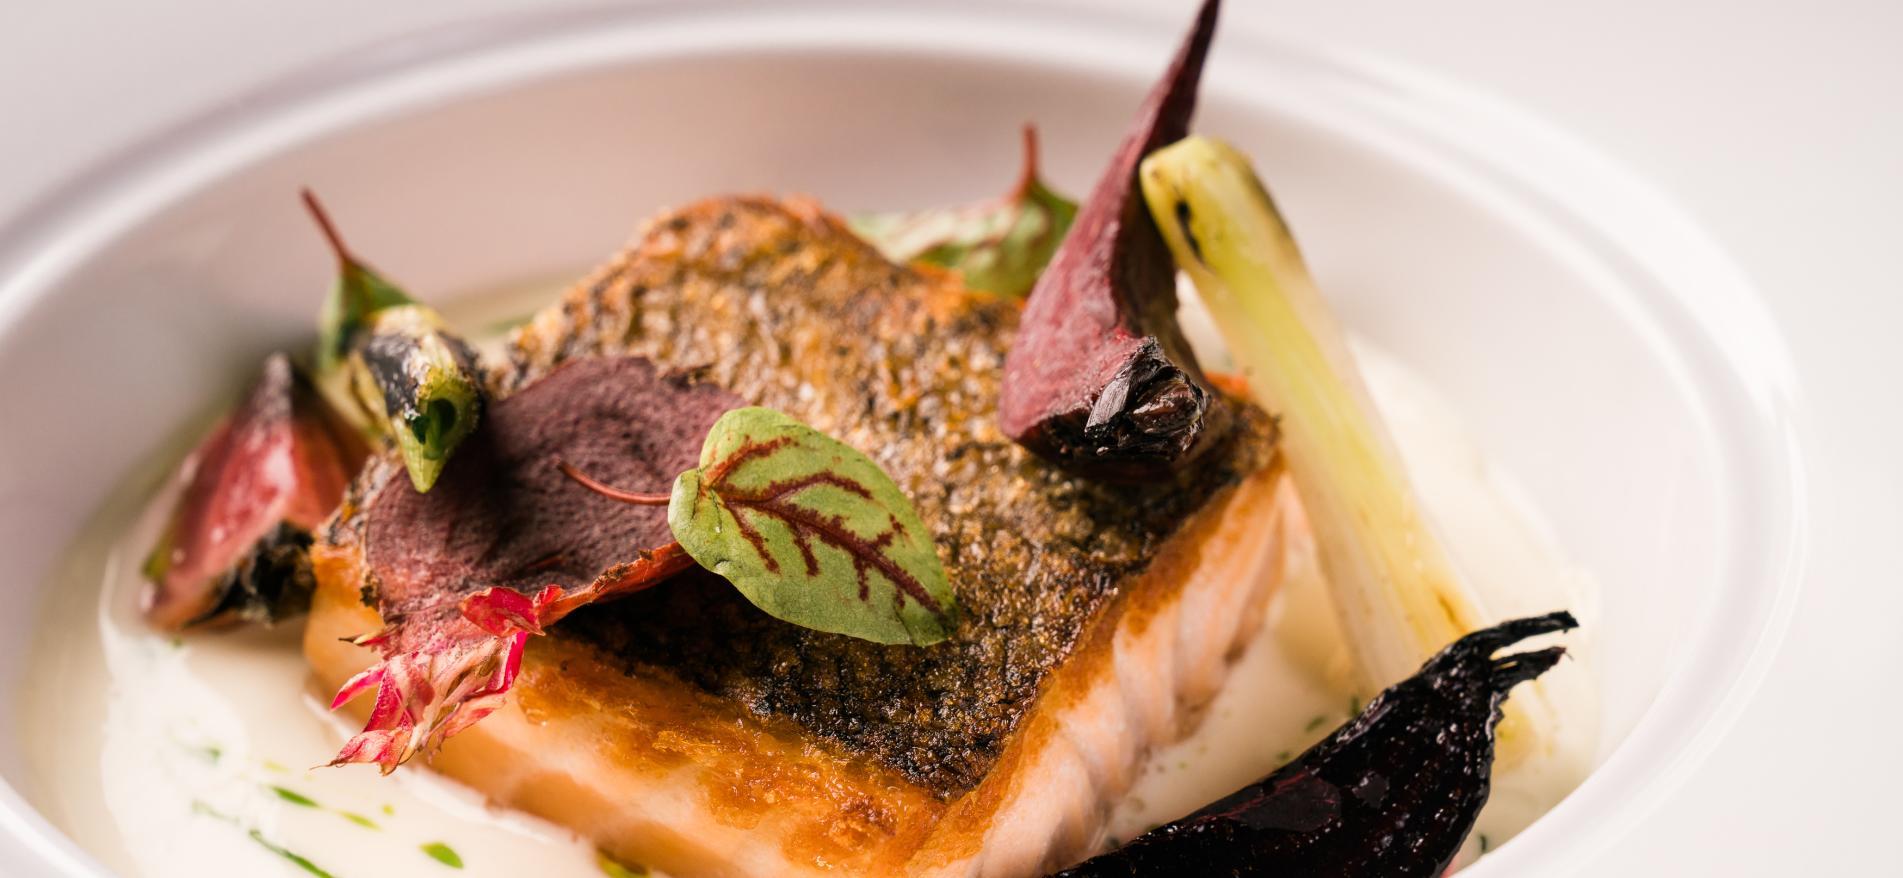 Dine Out Boston Boston Restaurant Week August 18 23 25